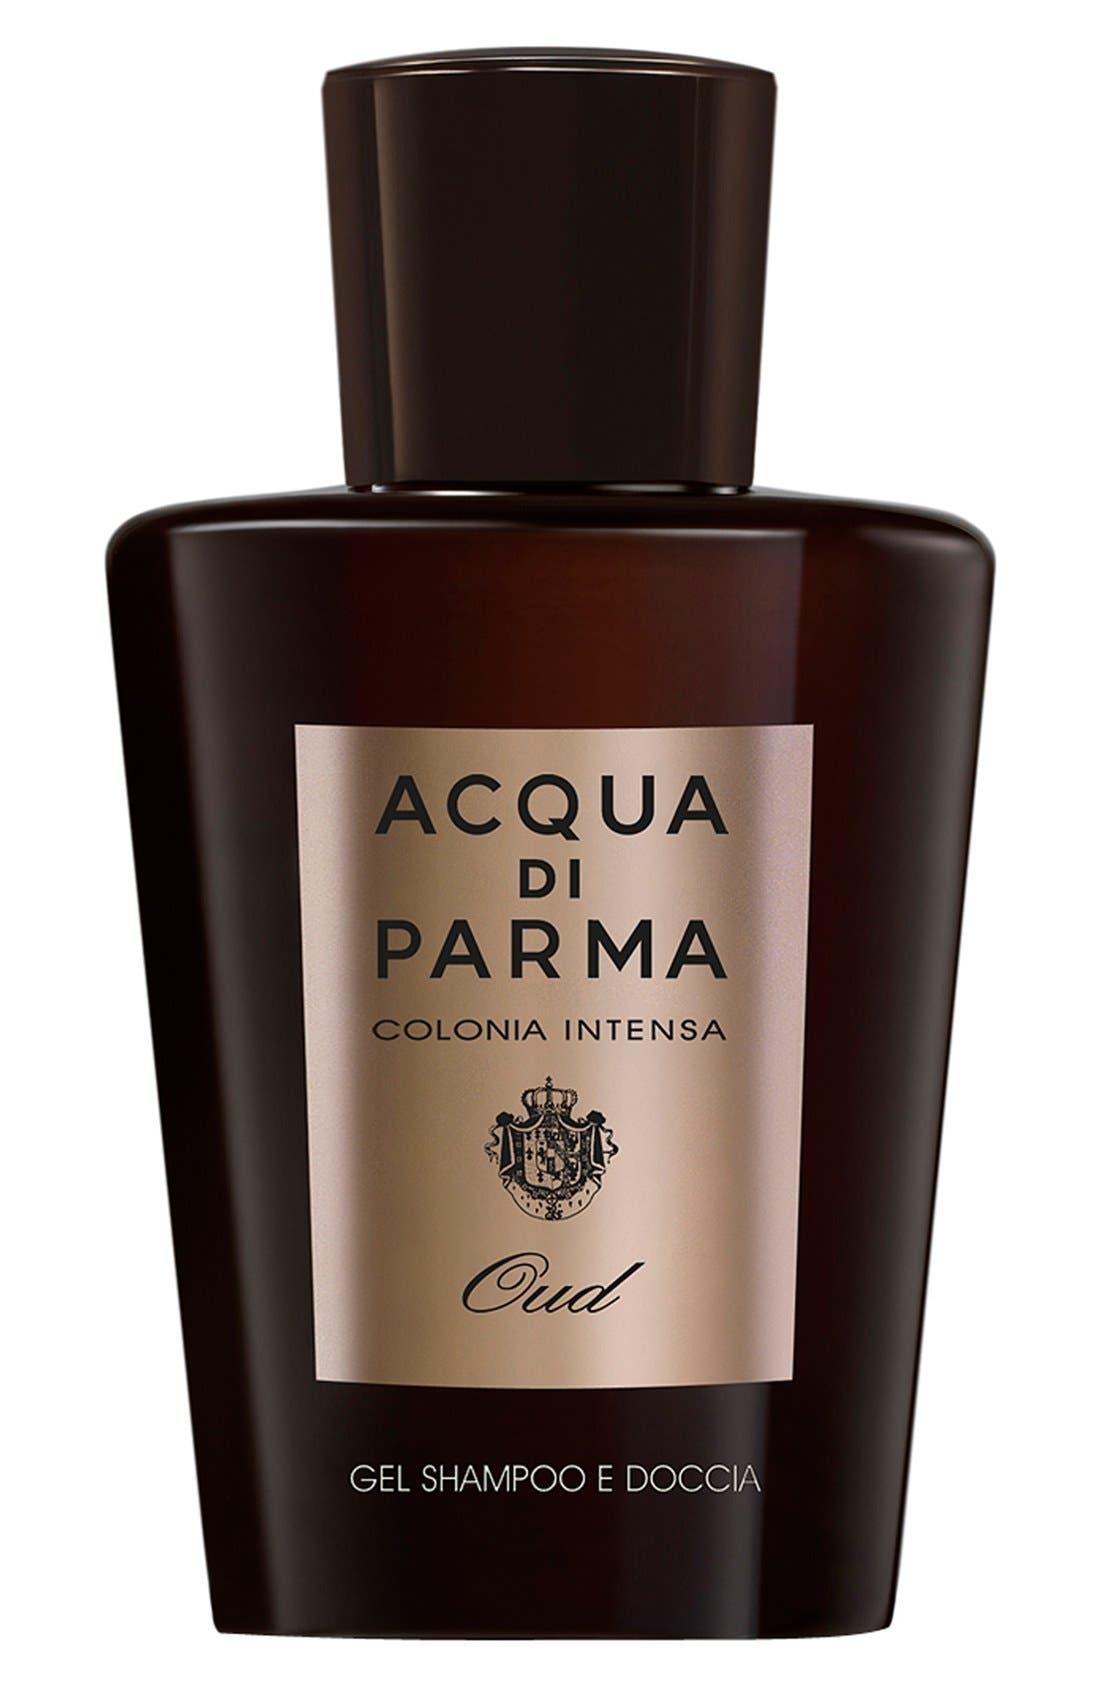 Acqua di Parma 'Colonia Intensa Oud' Shampoo & Shower Gel